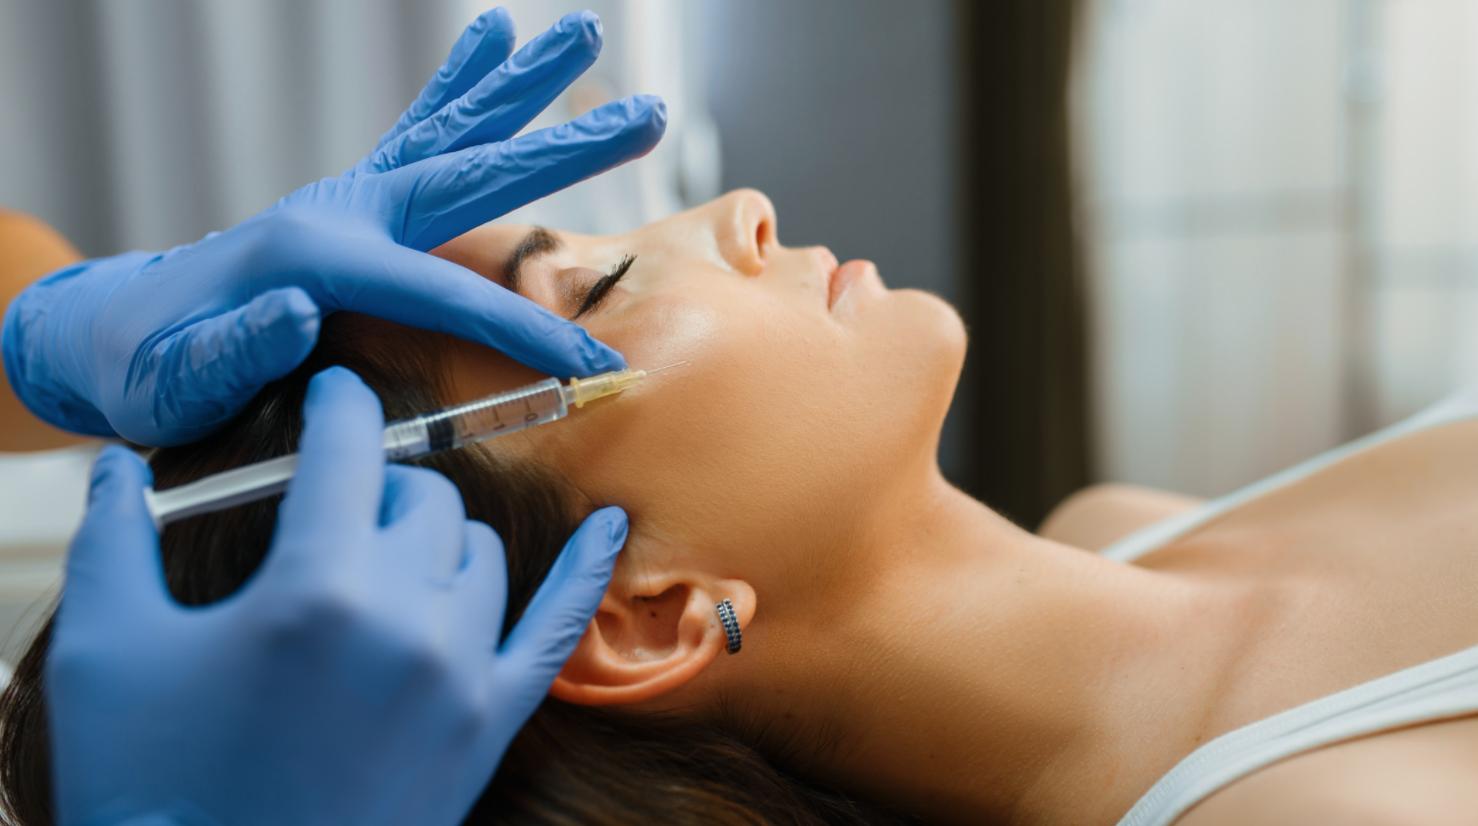 woman lying down getting cheek injected